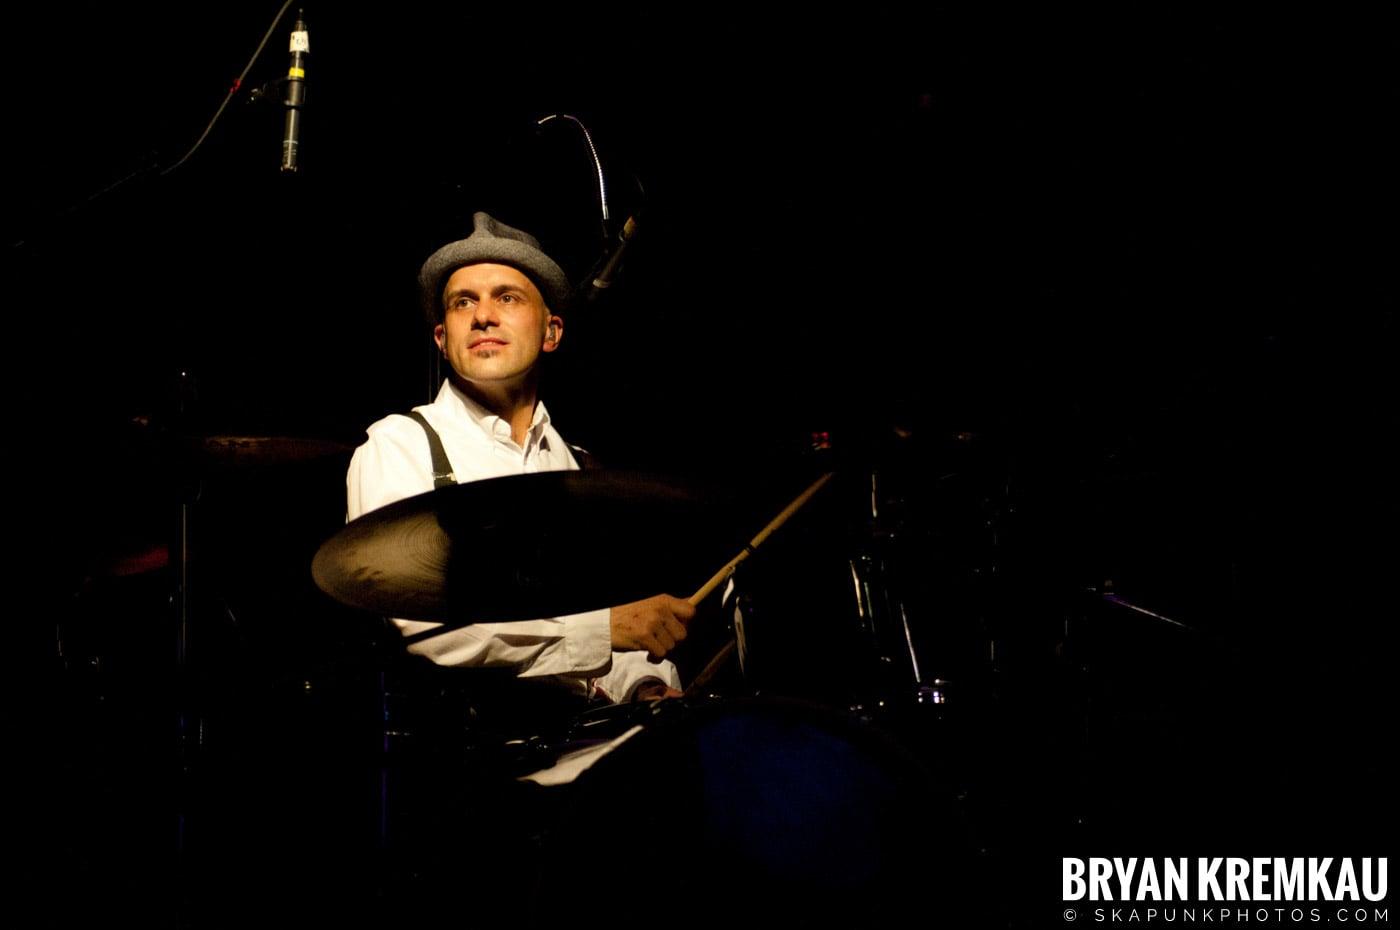 Frank Turner & The Sleeping Souls @ Webster Hall, NYC - 9.29.12 (11)